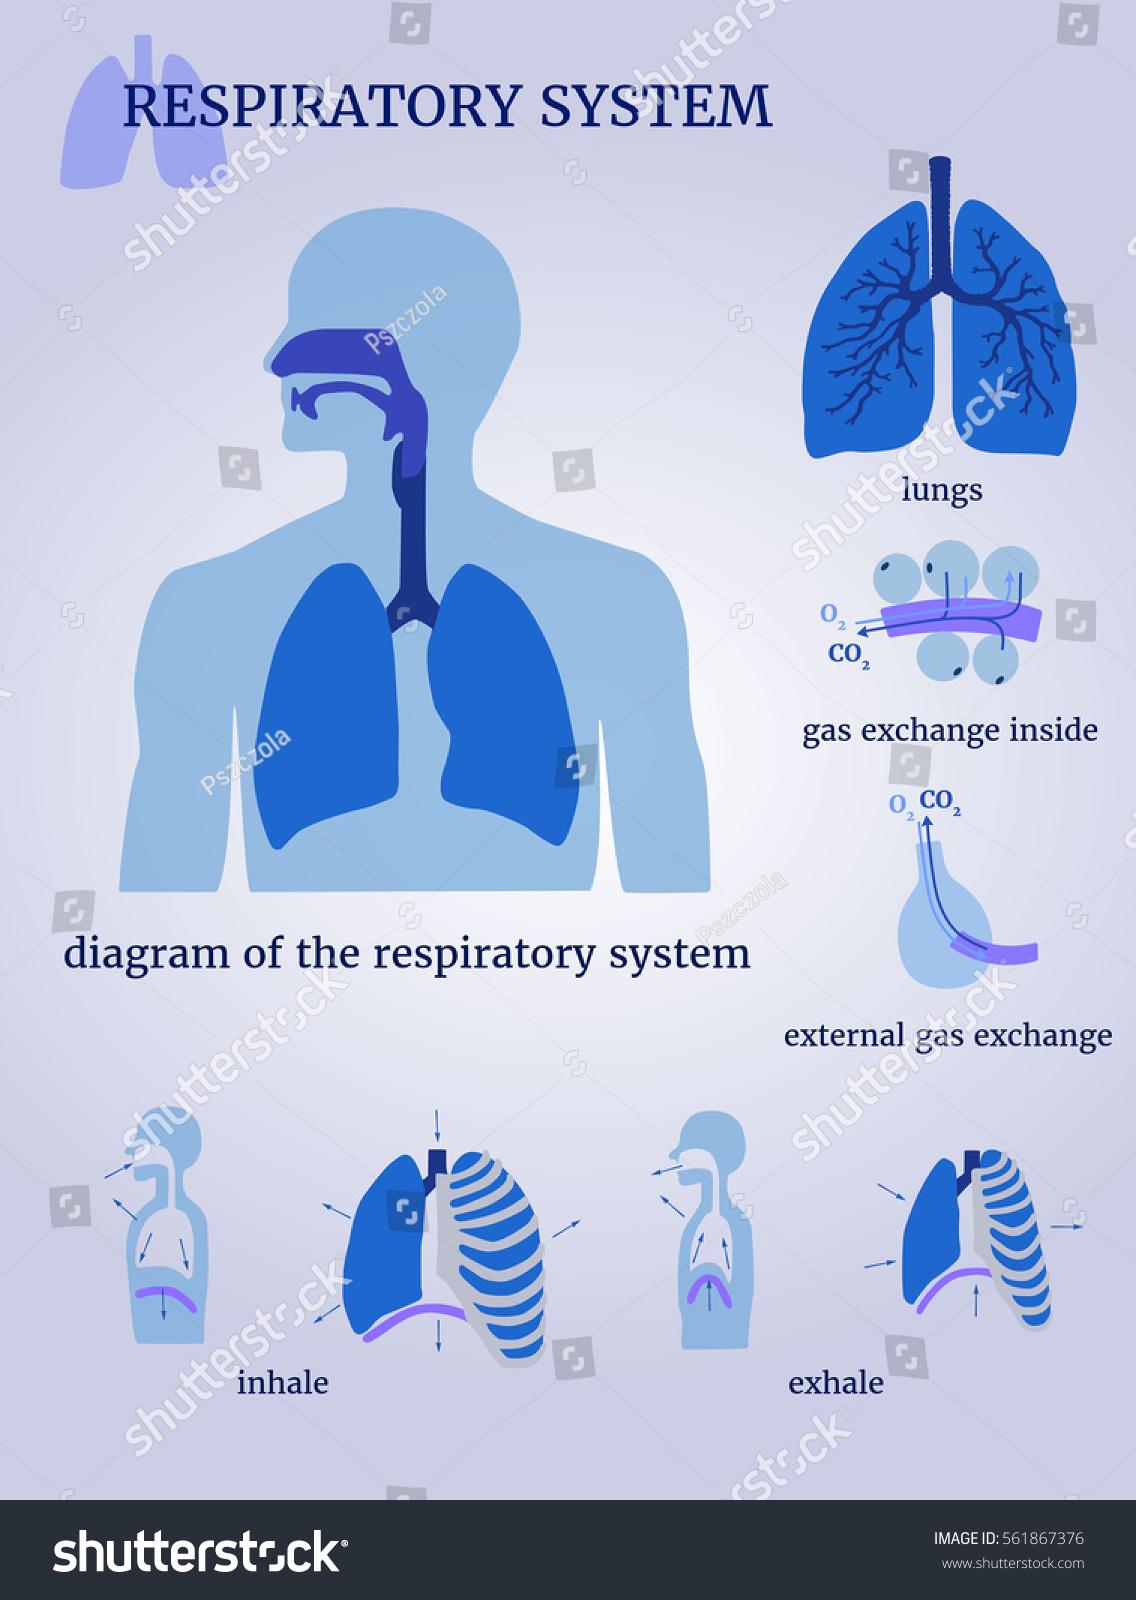 Respiratory system diagram respiratory system lungs stock vector respiratory system diagram of the respiratory system with lungs inside gas exchange external pooptronica